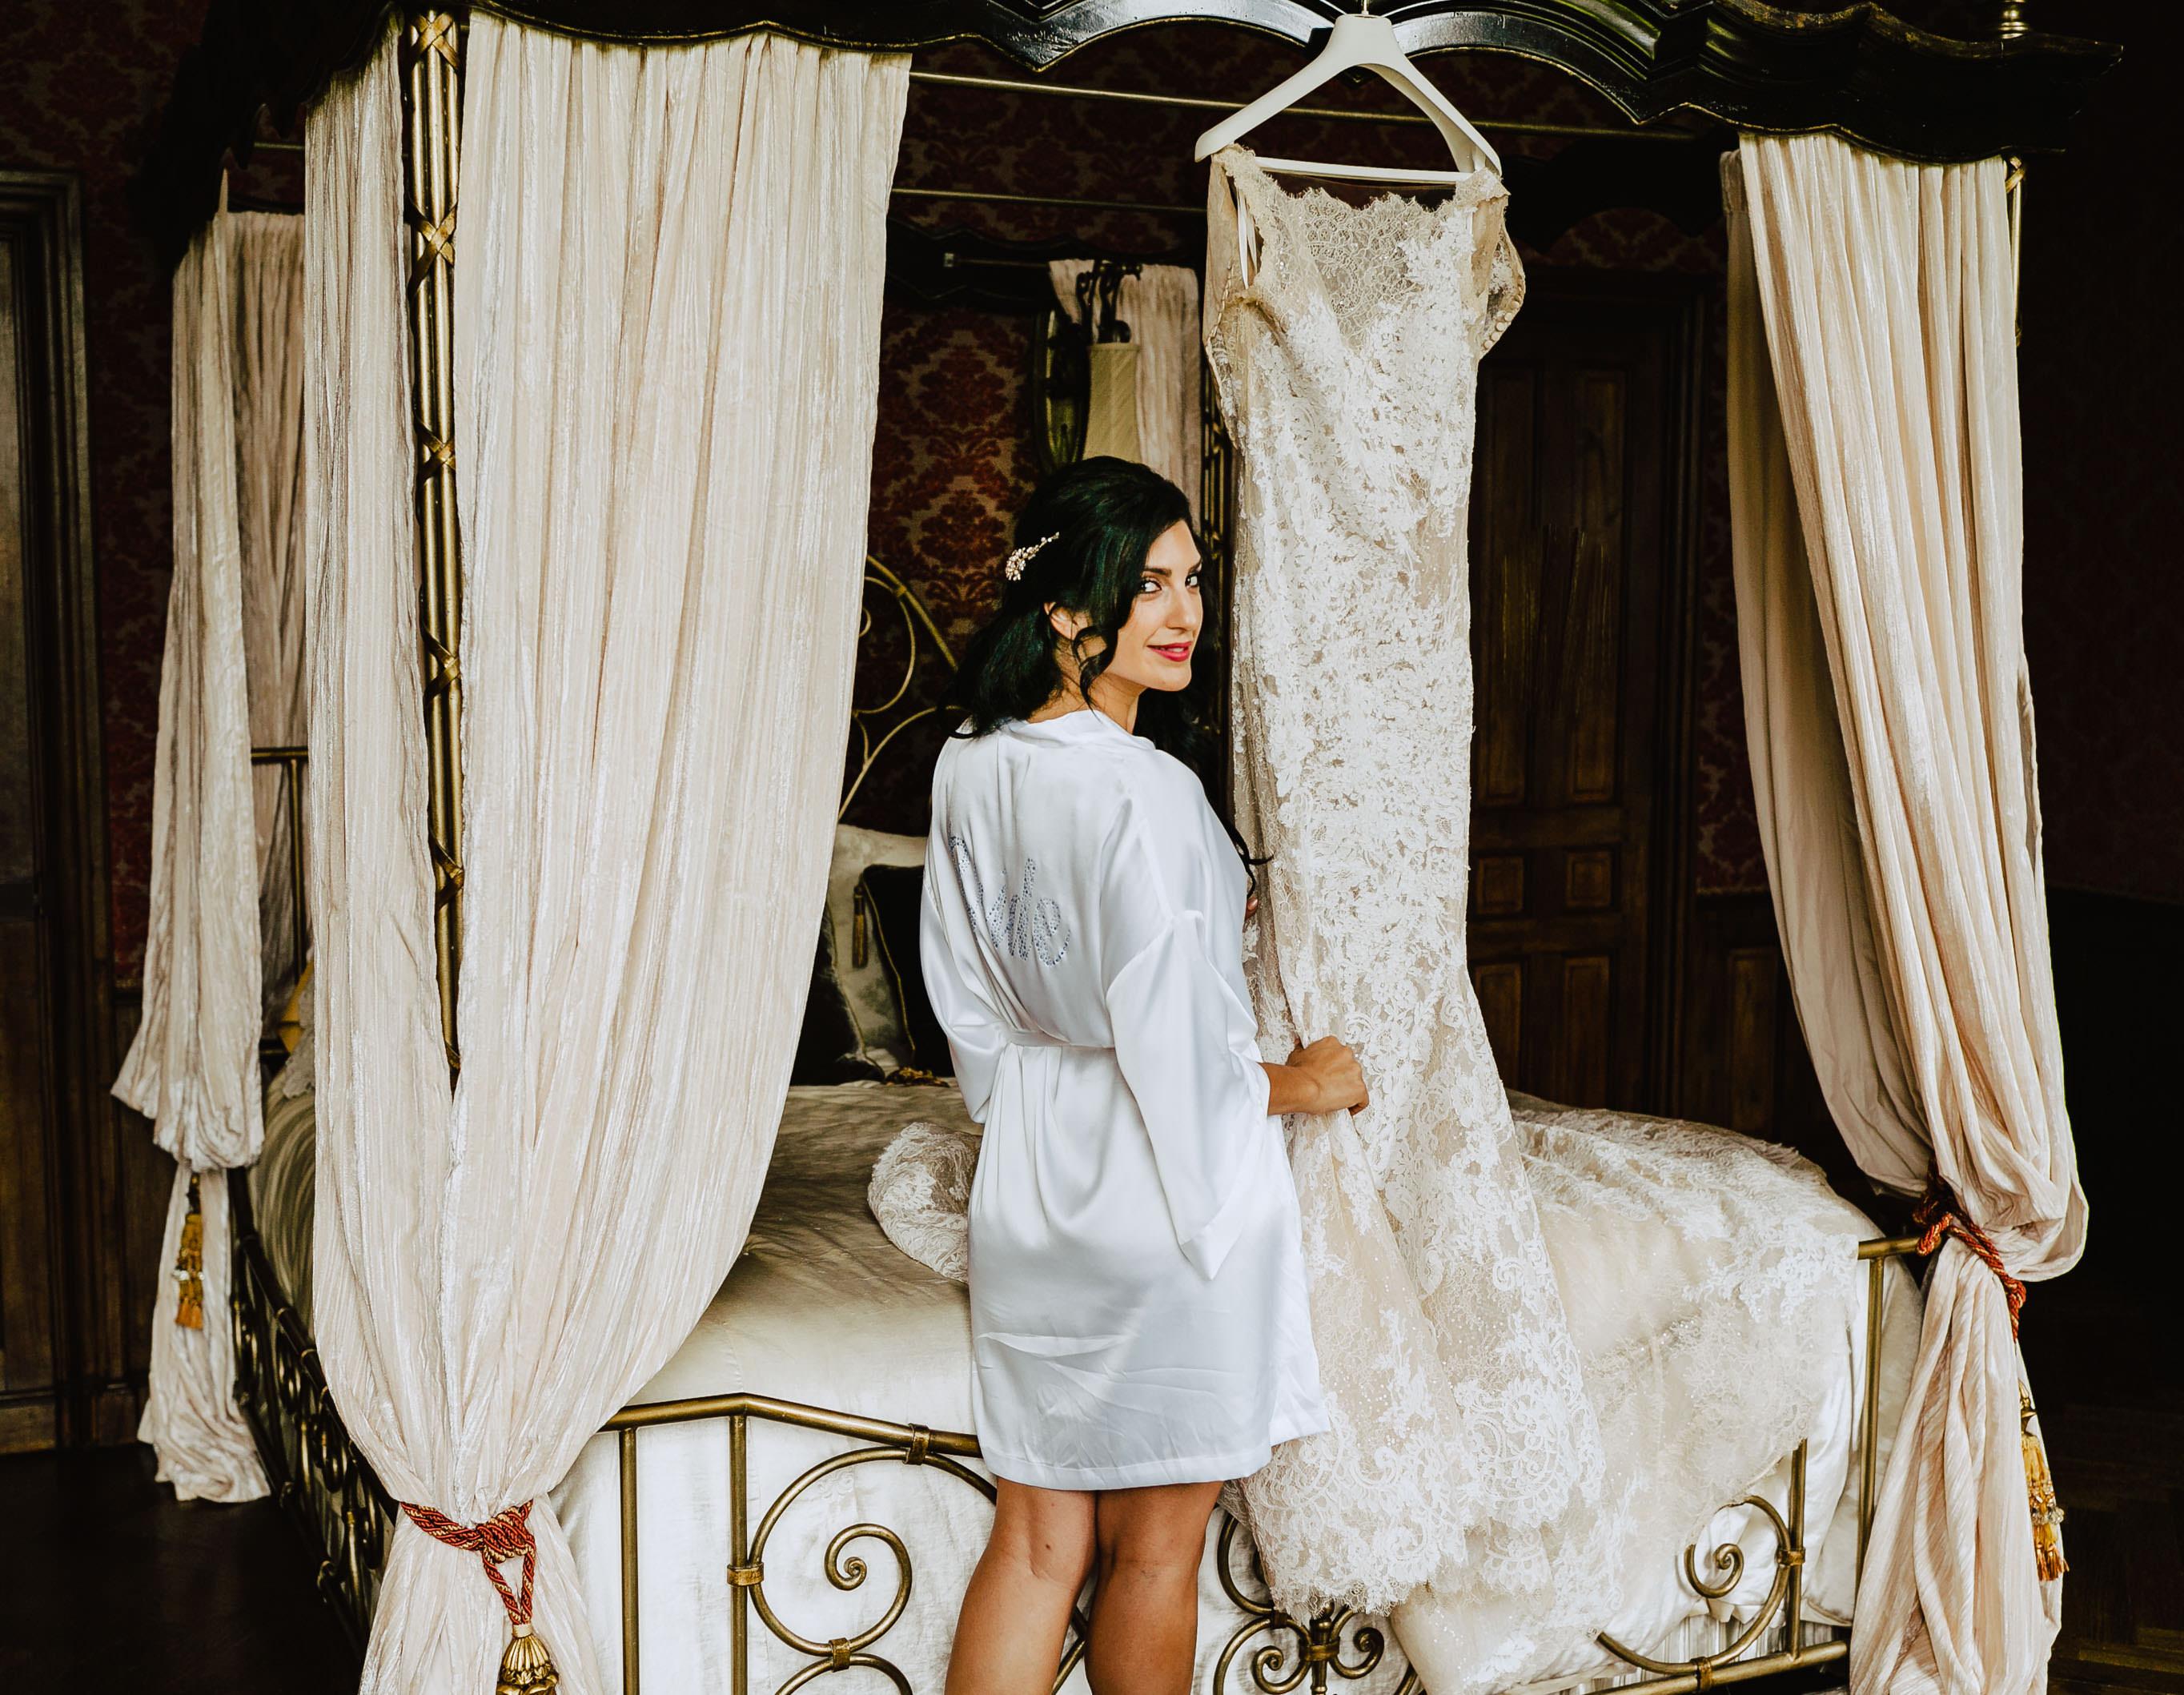 bride with her galia lahav dress chateau challain